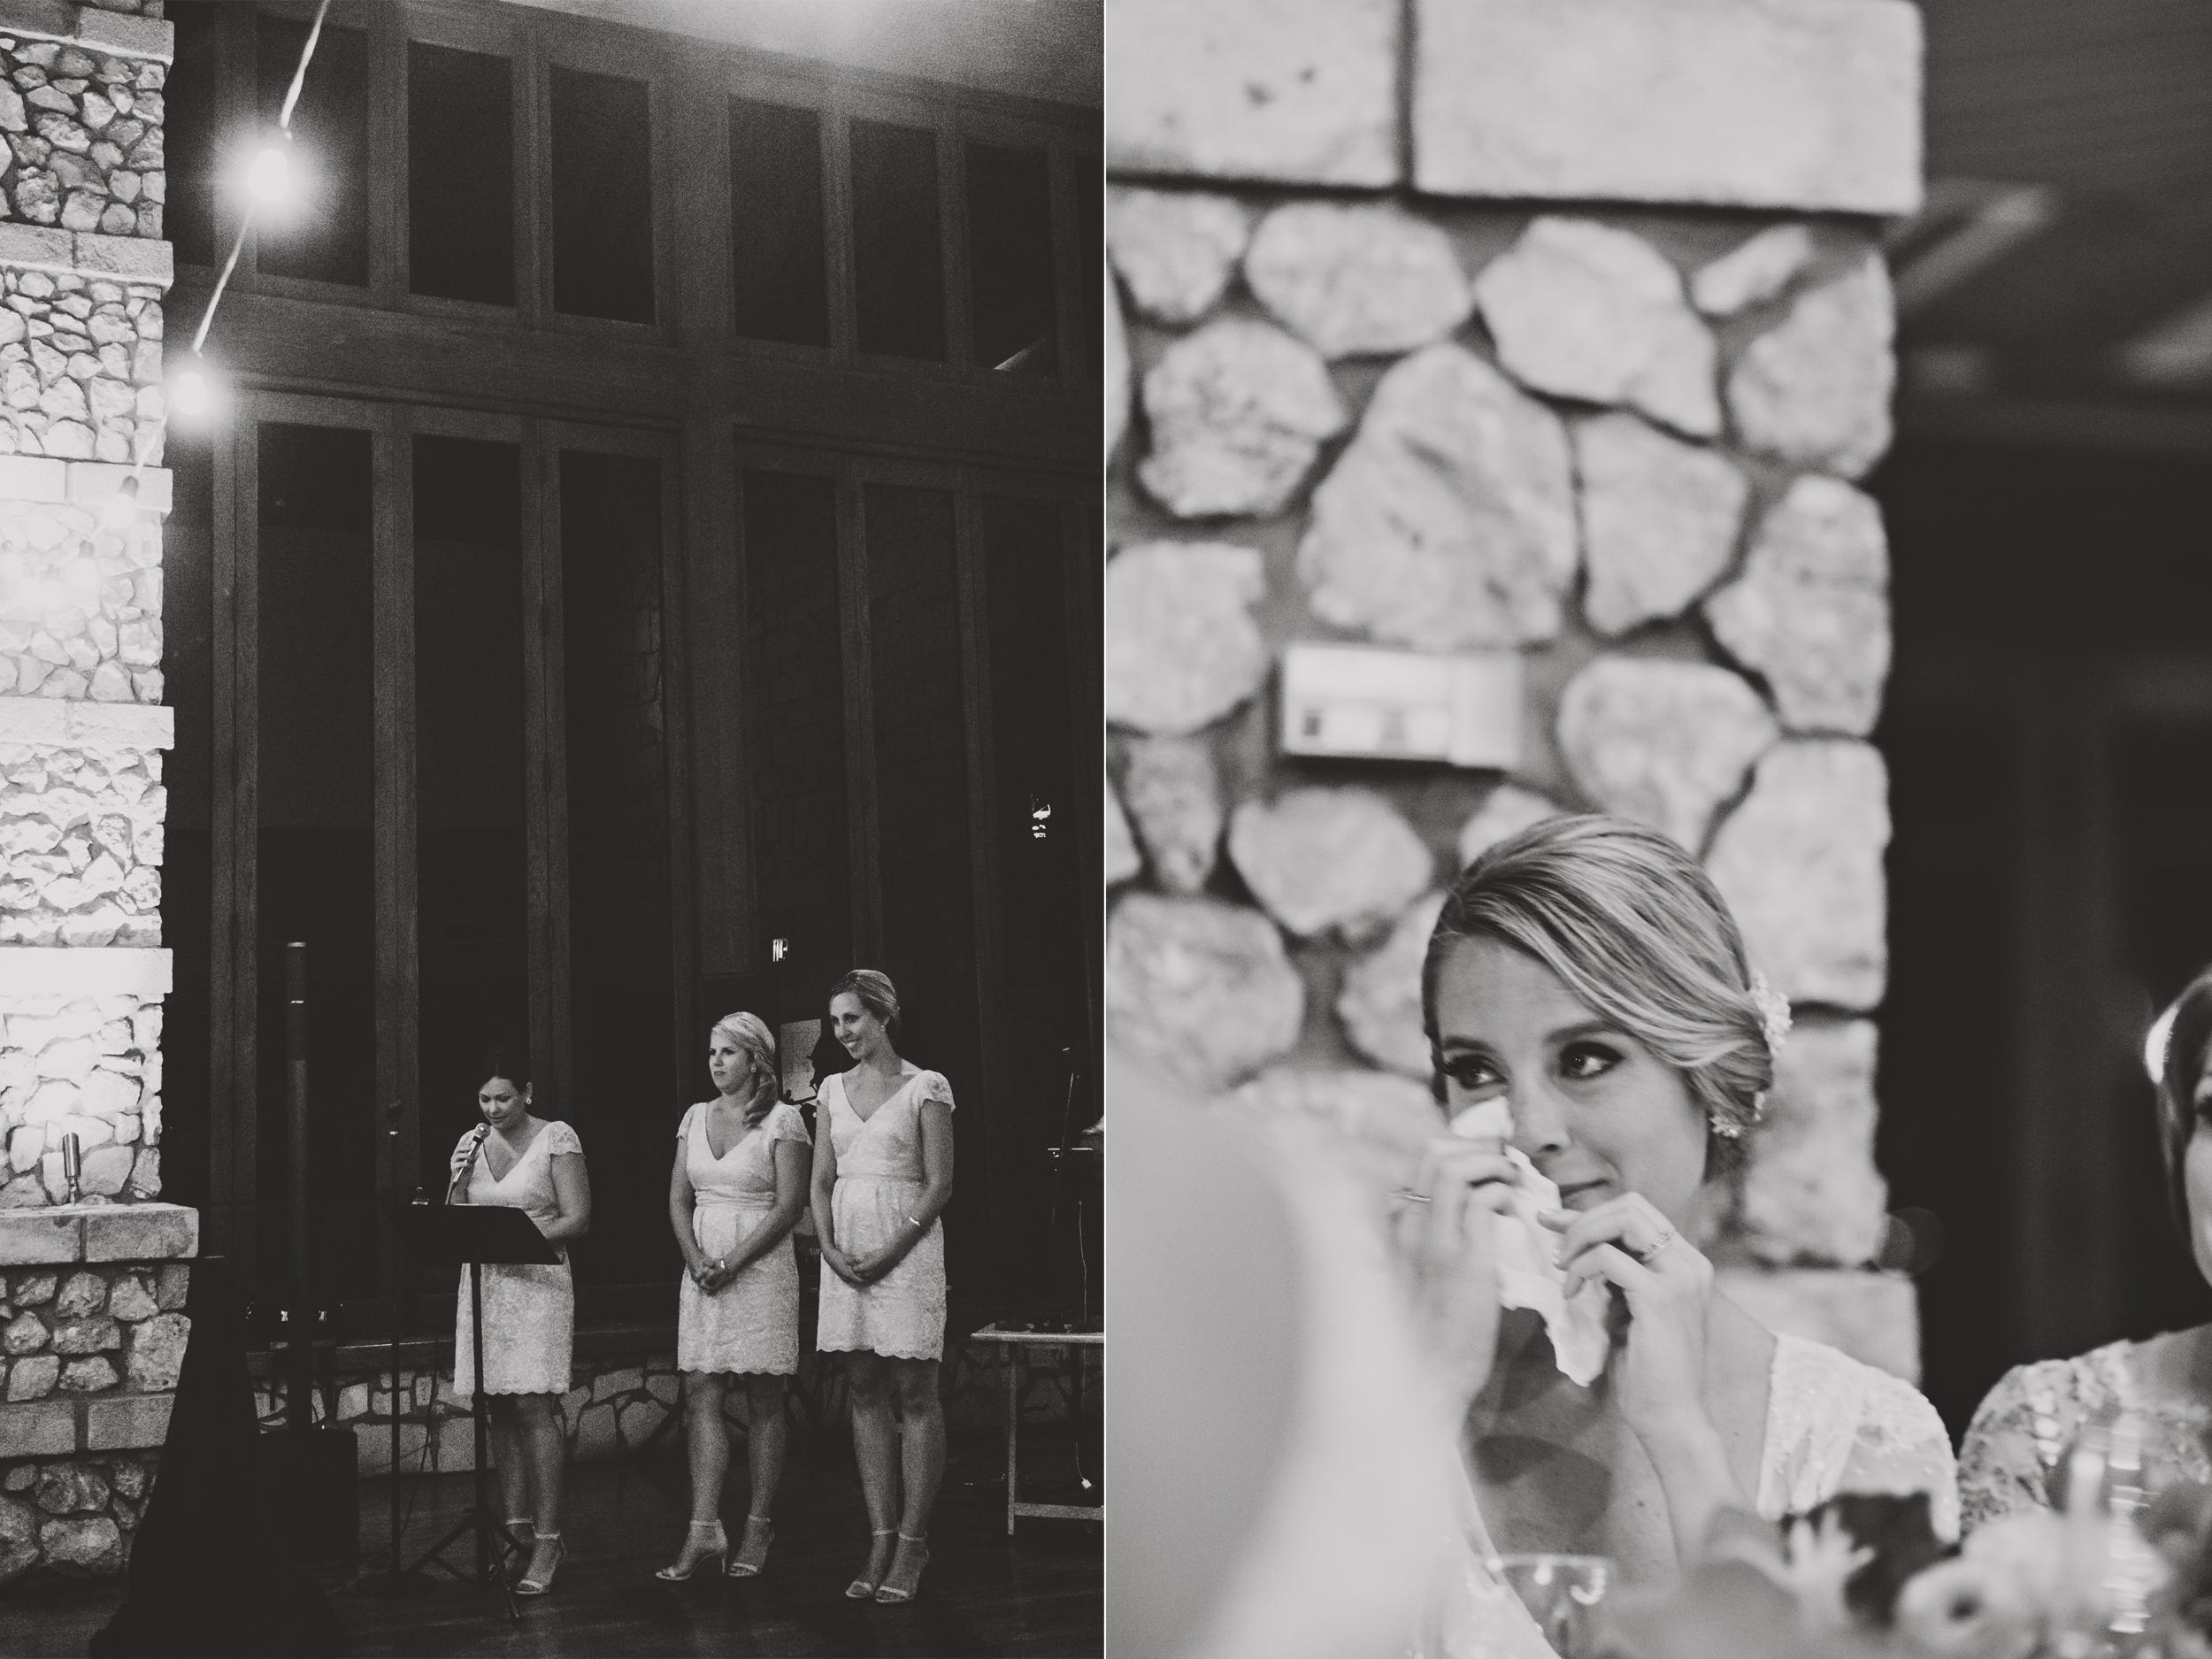 angie-diaz-photography-maui-wedding-mel-matt-104.jpg